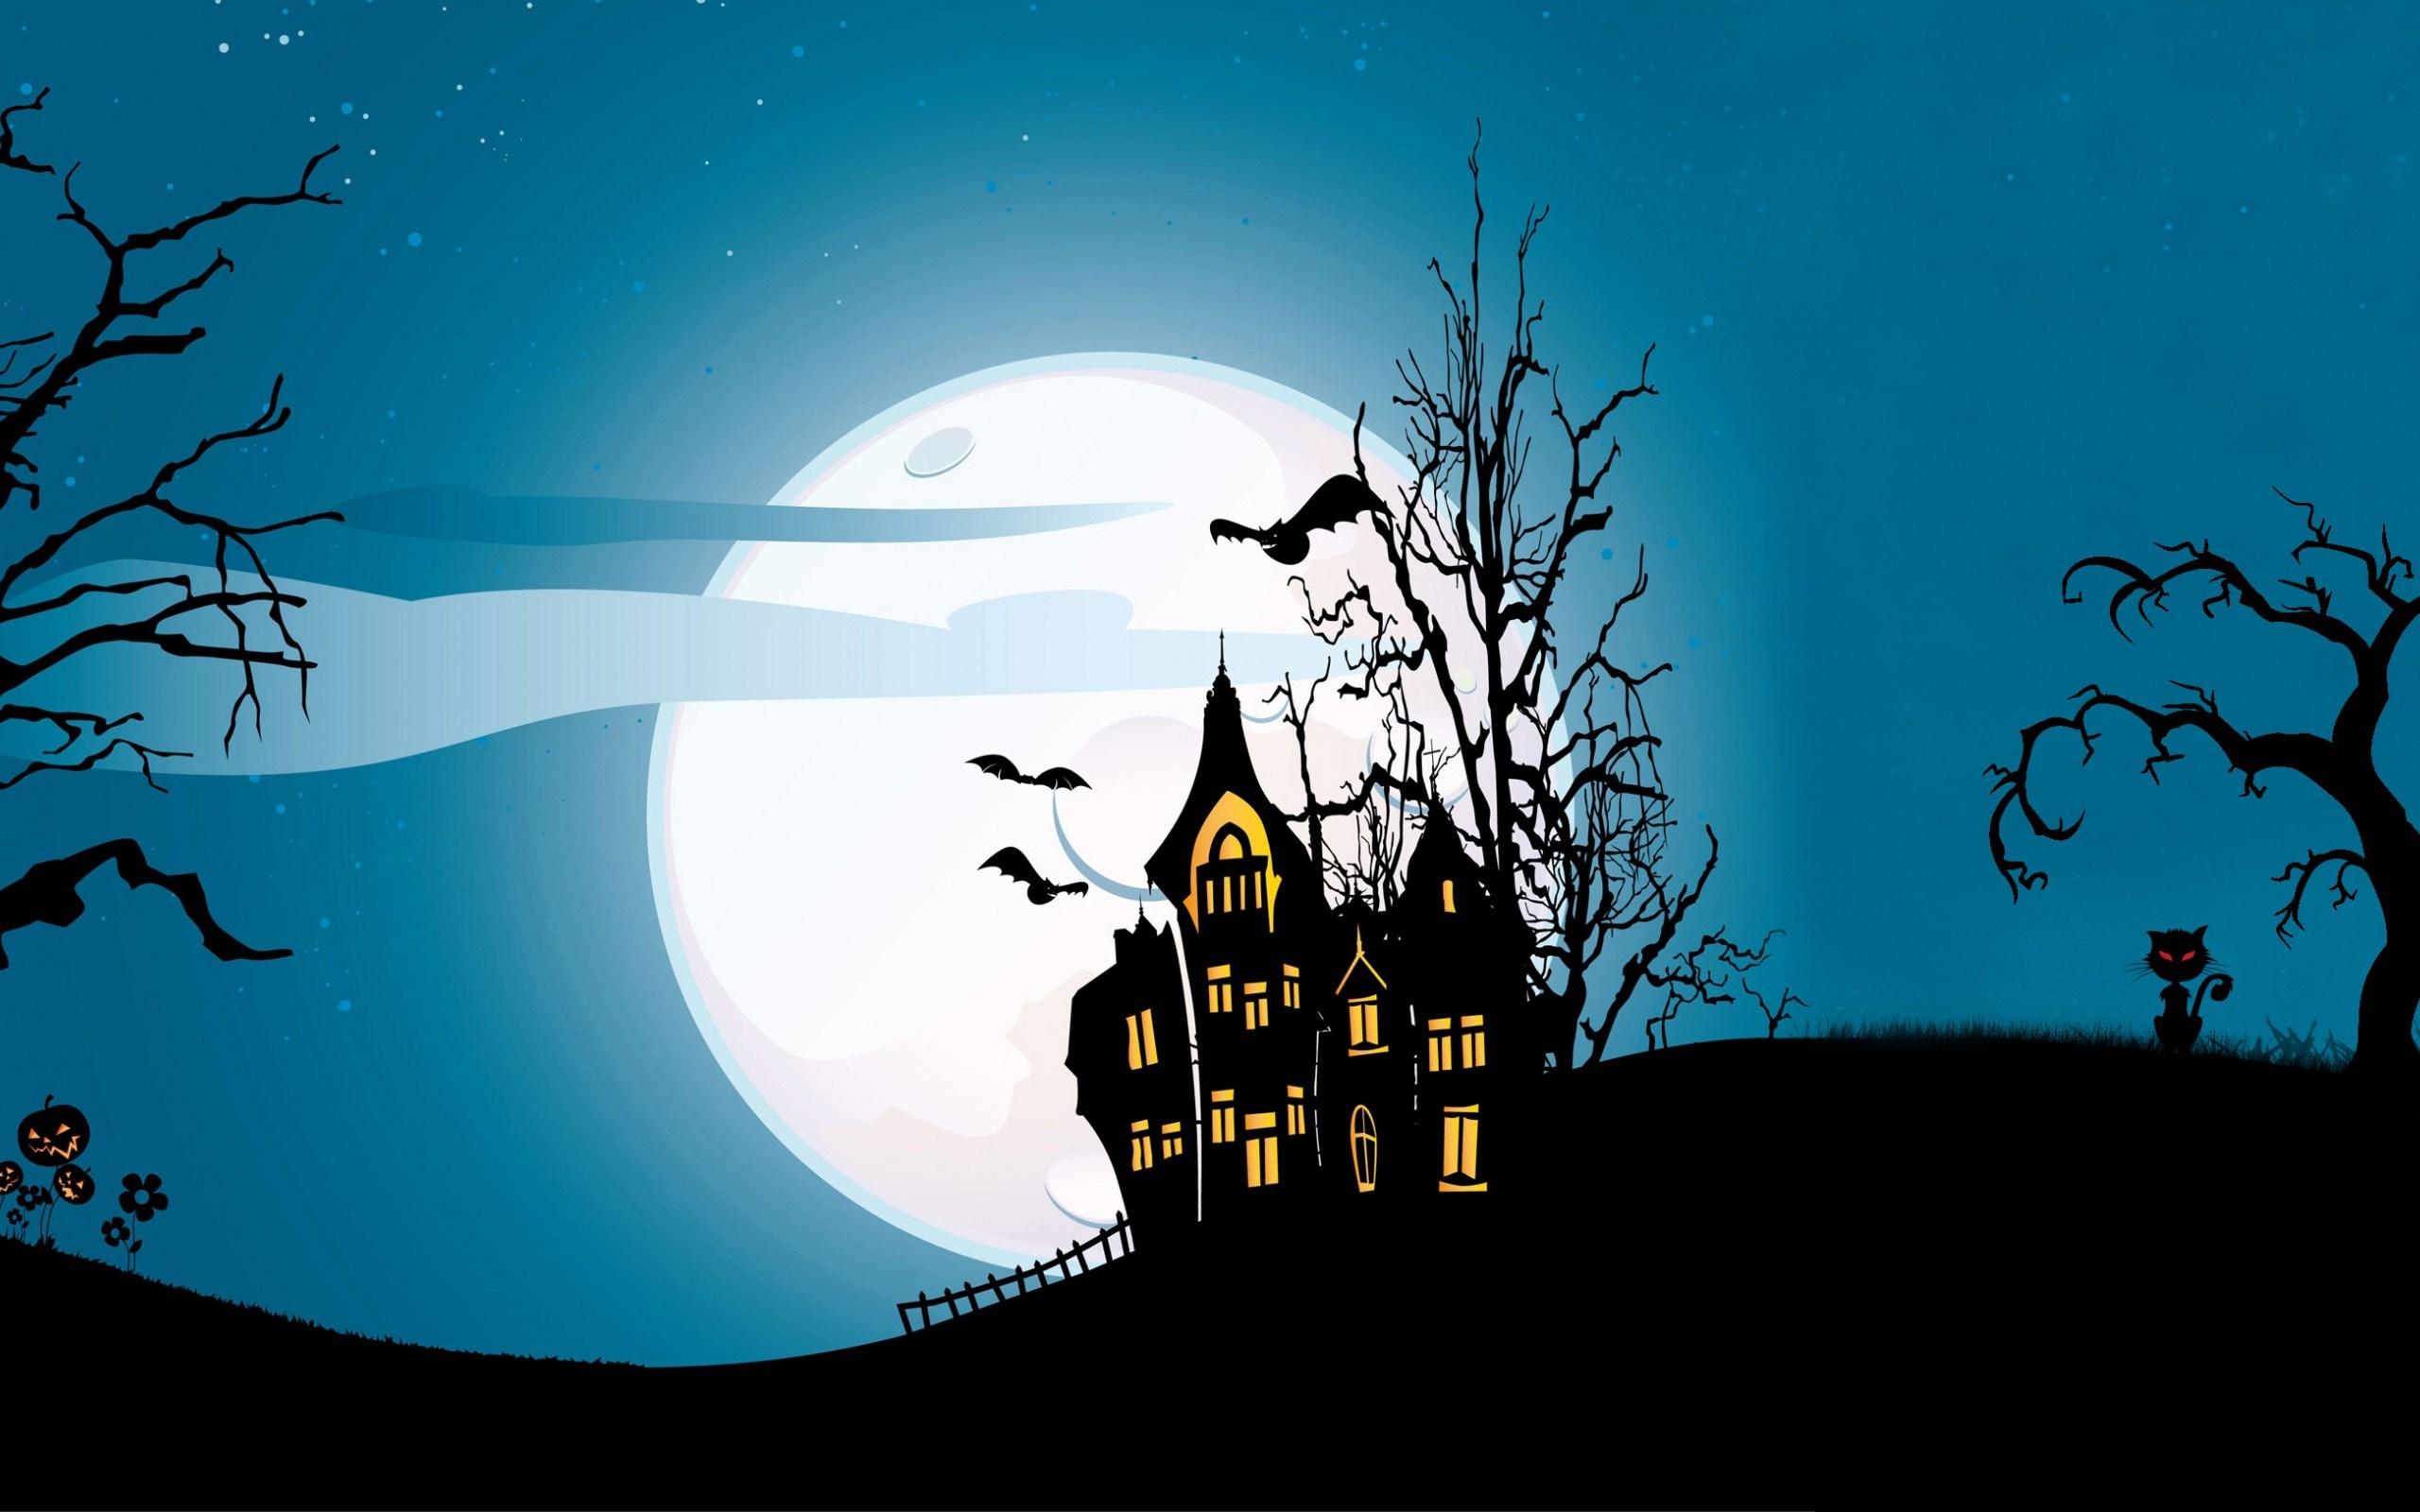 Halloween Creepy Scary Pumpkins Bats House Full Moon Midnight